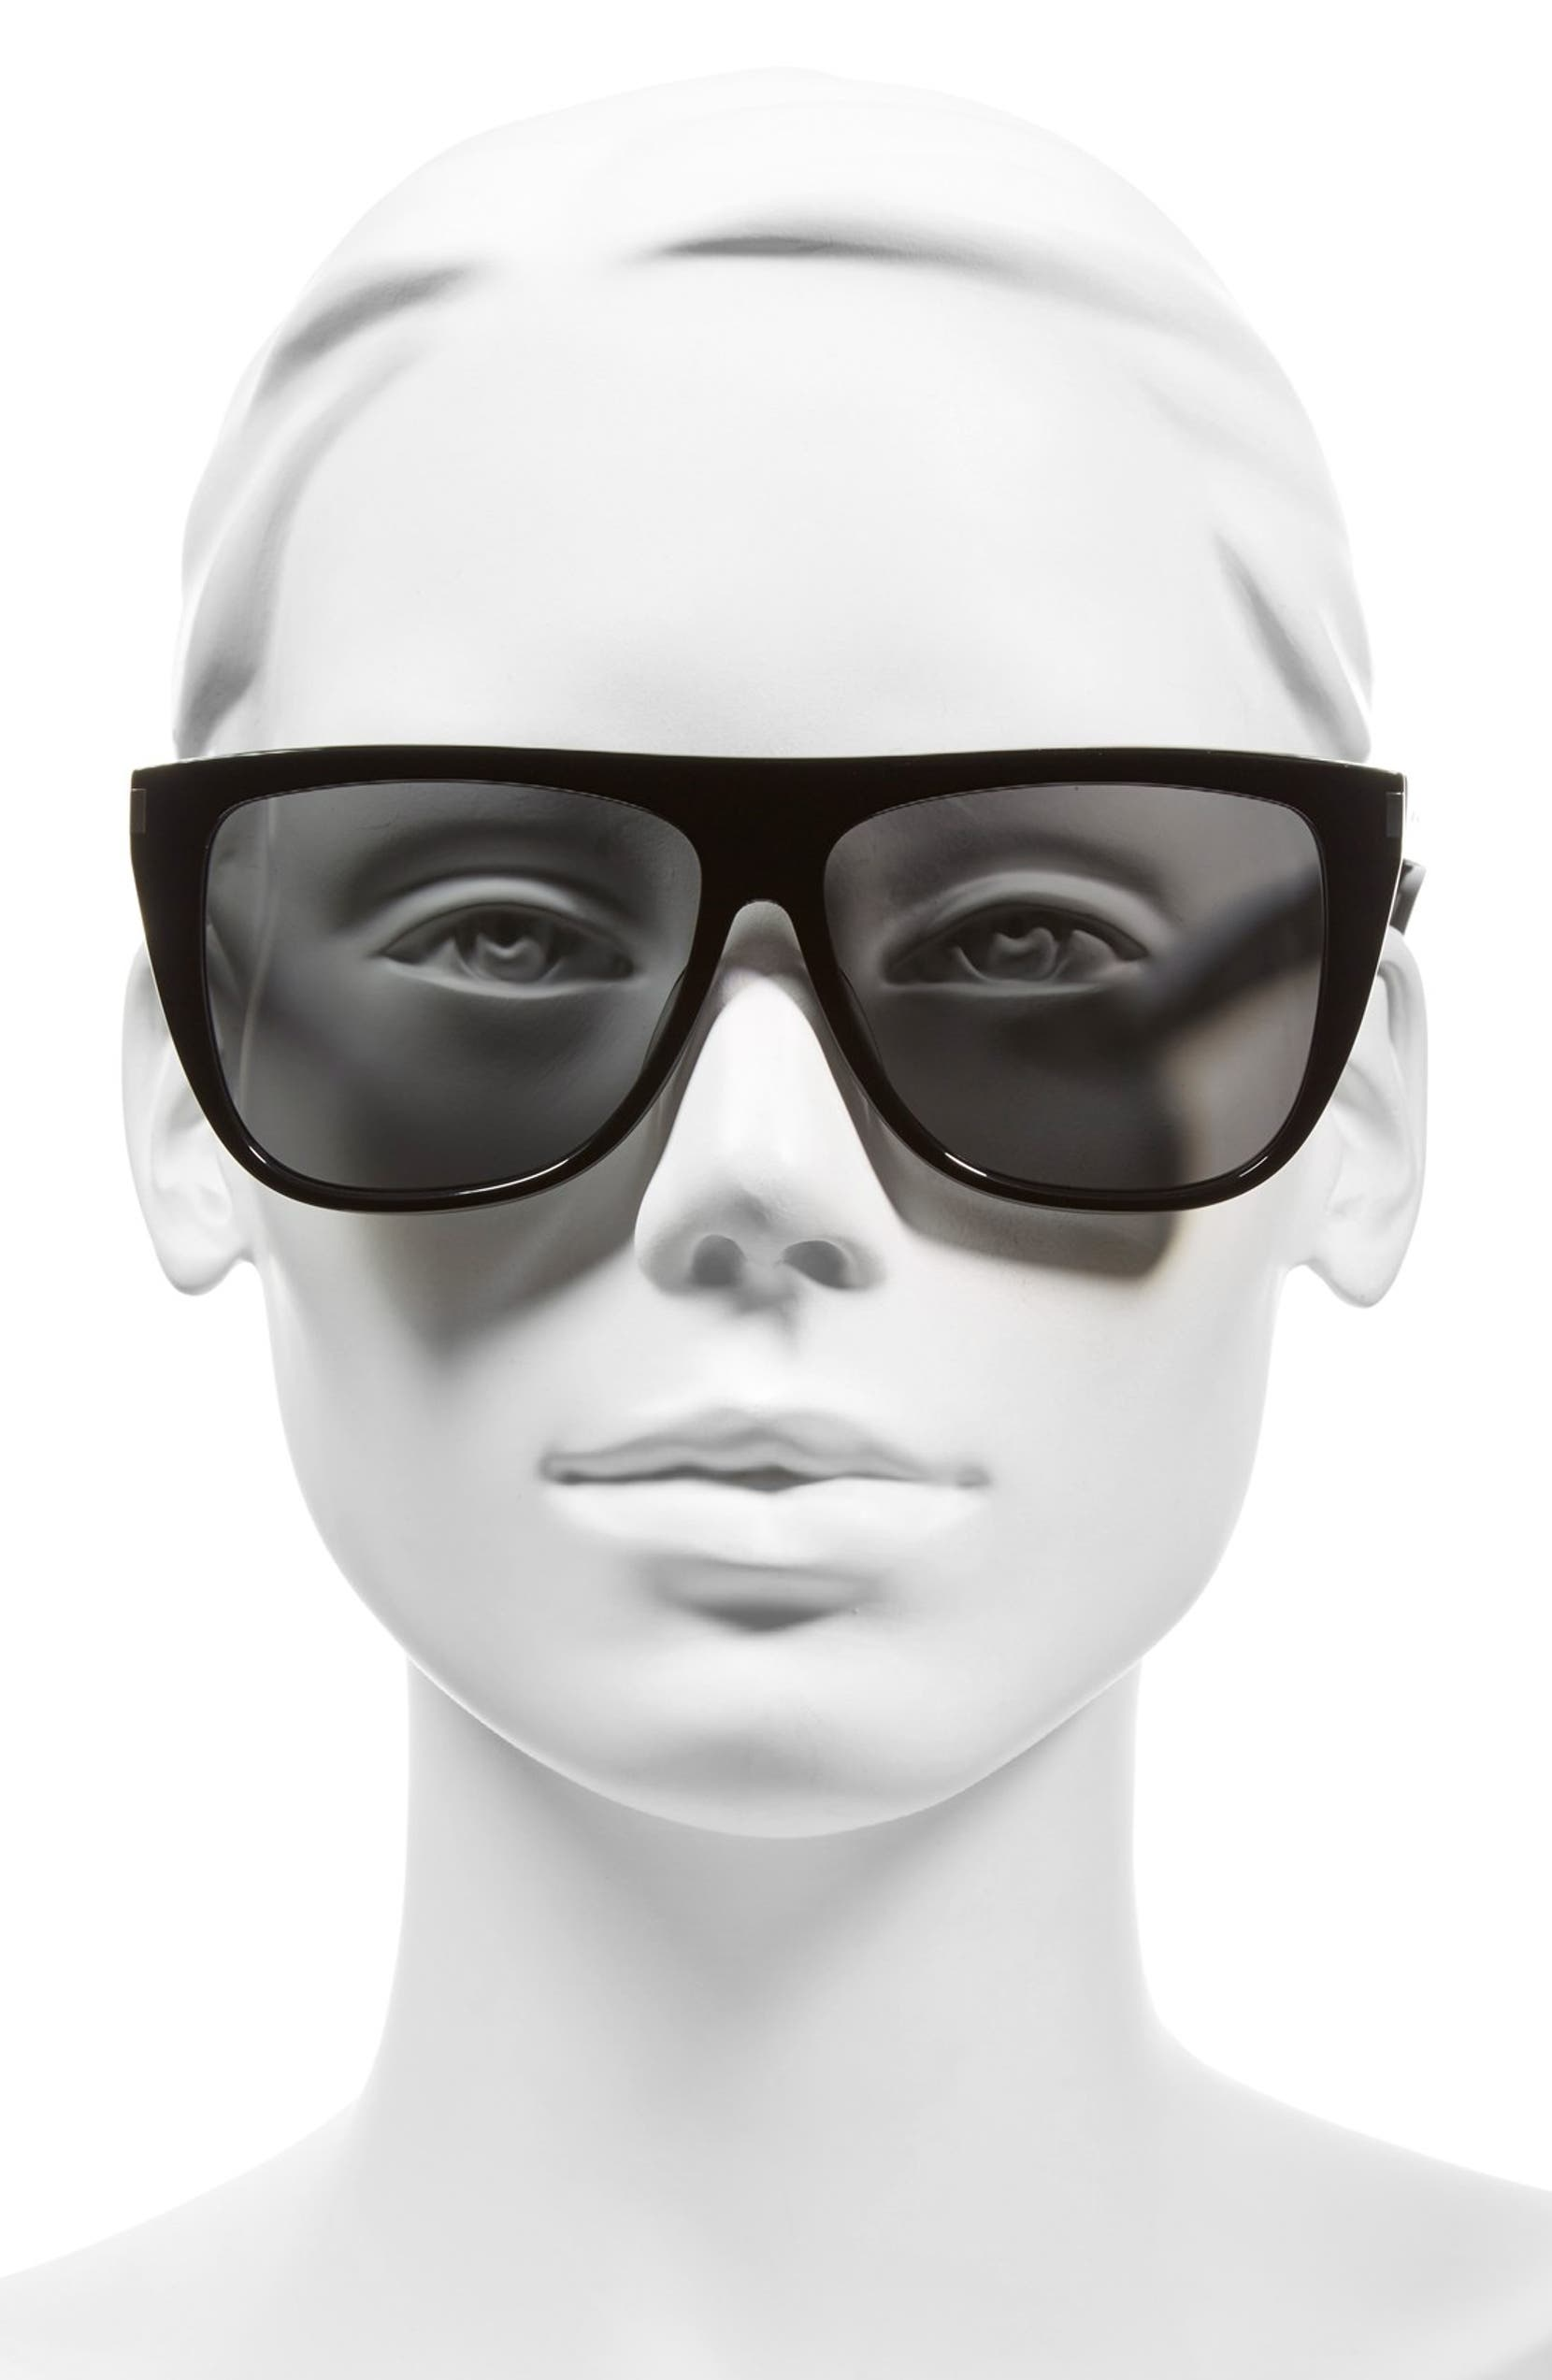 06dd15f23bb Saint Laurent SL1 59mm Flat Top Sunglasses   Nordstrom